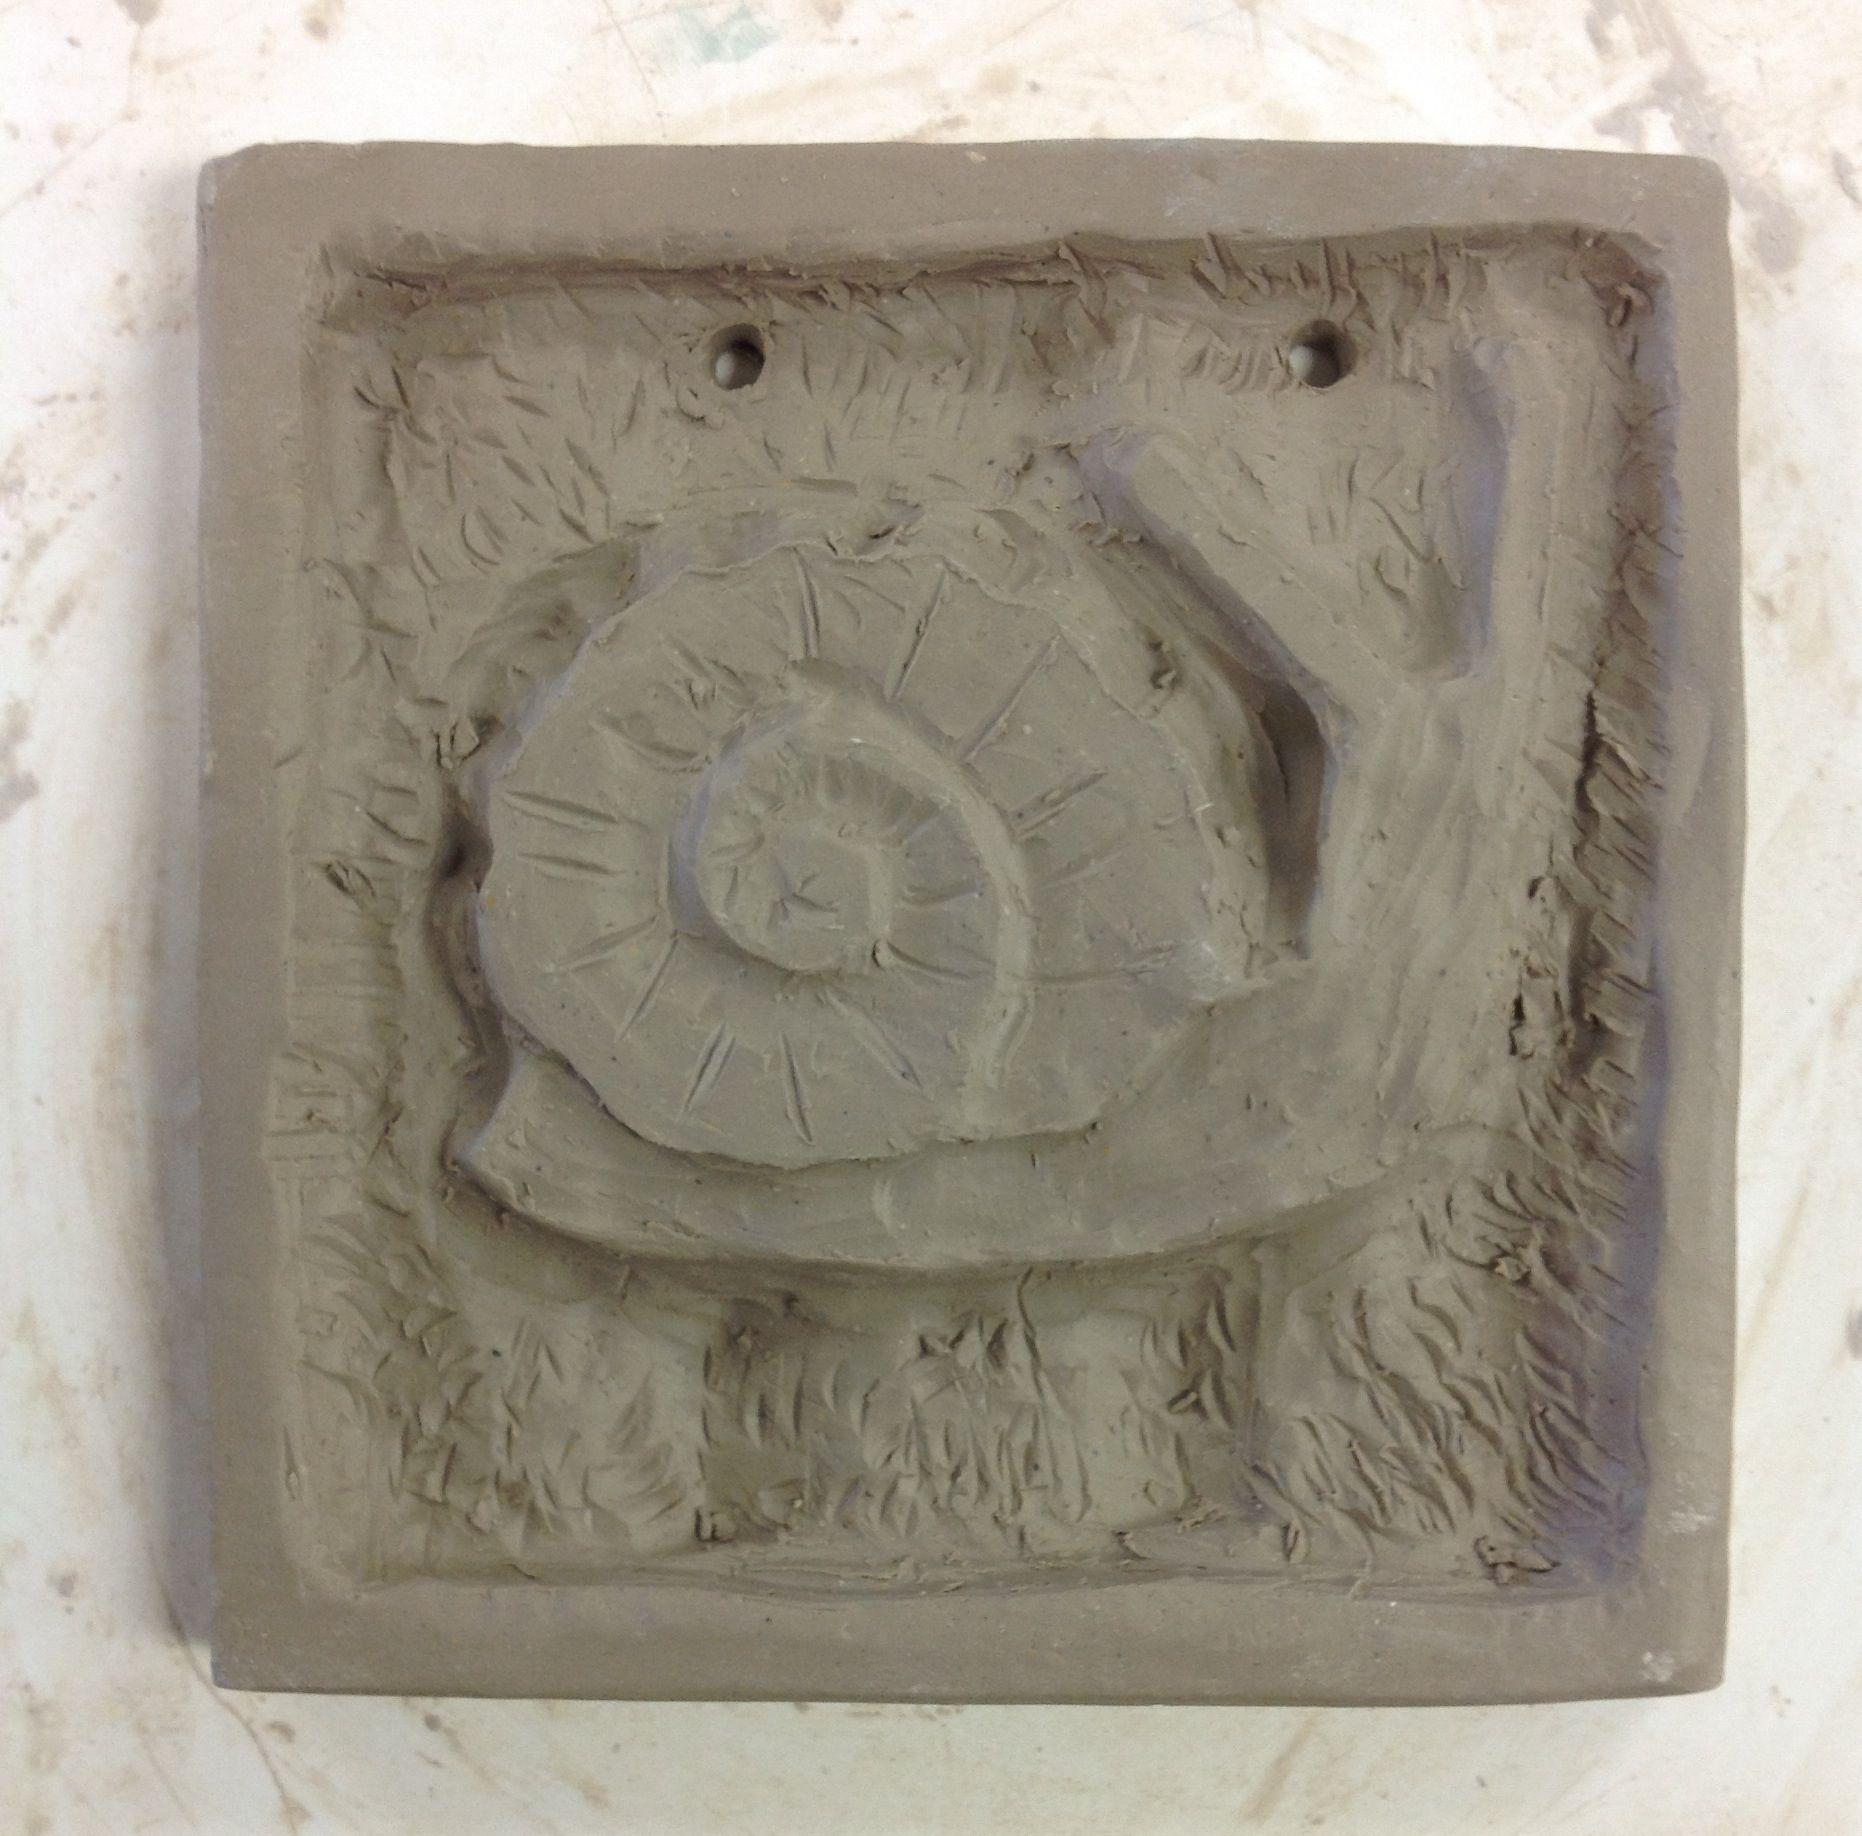 5x5 ceramic relief tile high school ceramic lessons. Black Bedroom Furniture Sets. Home Design Ideas